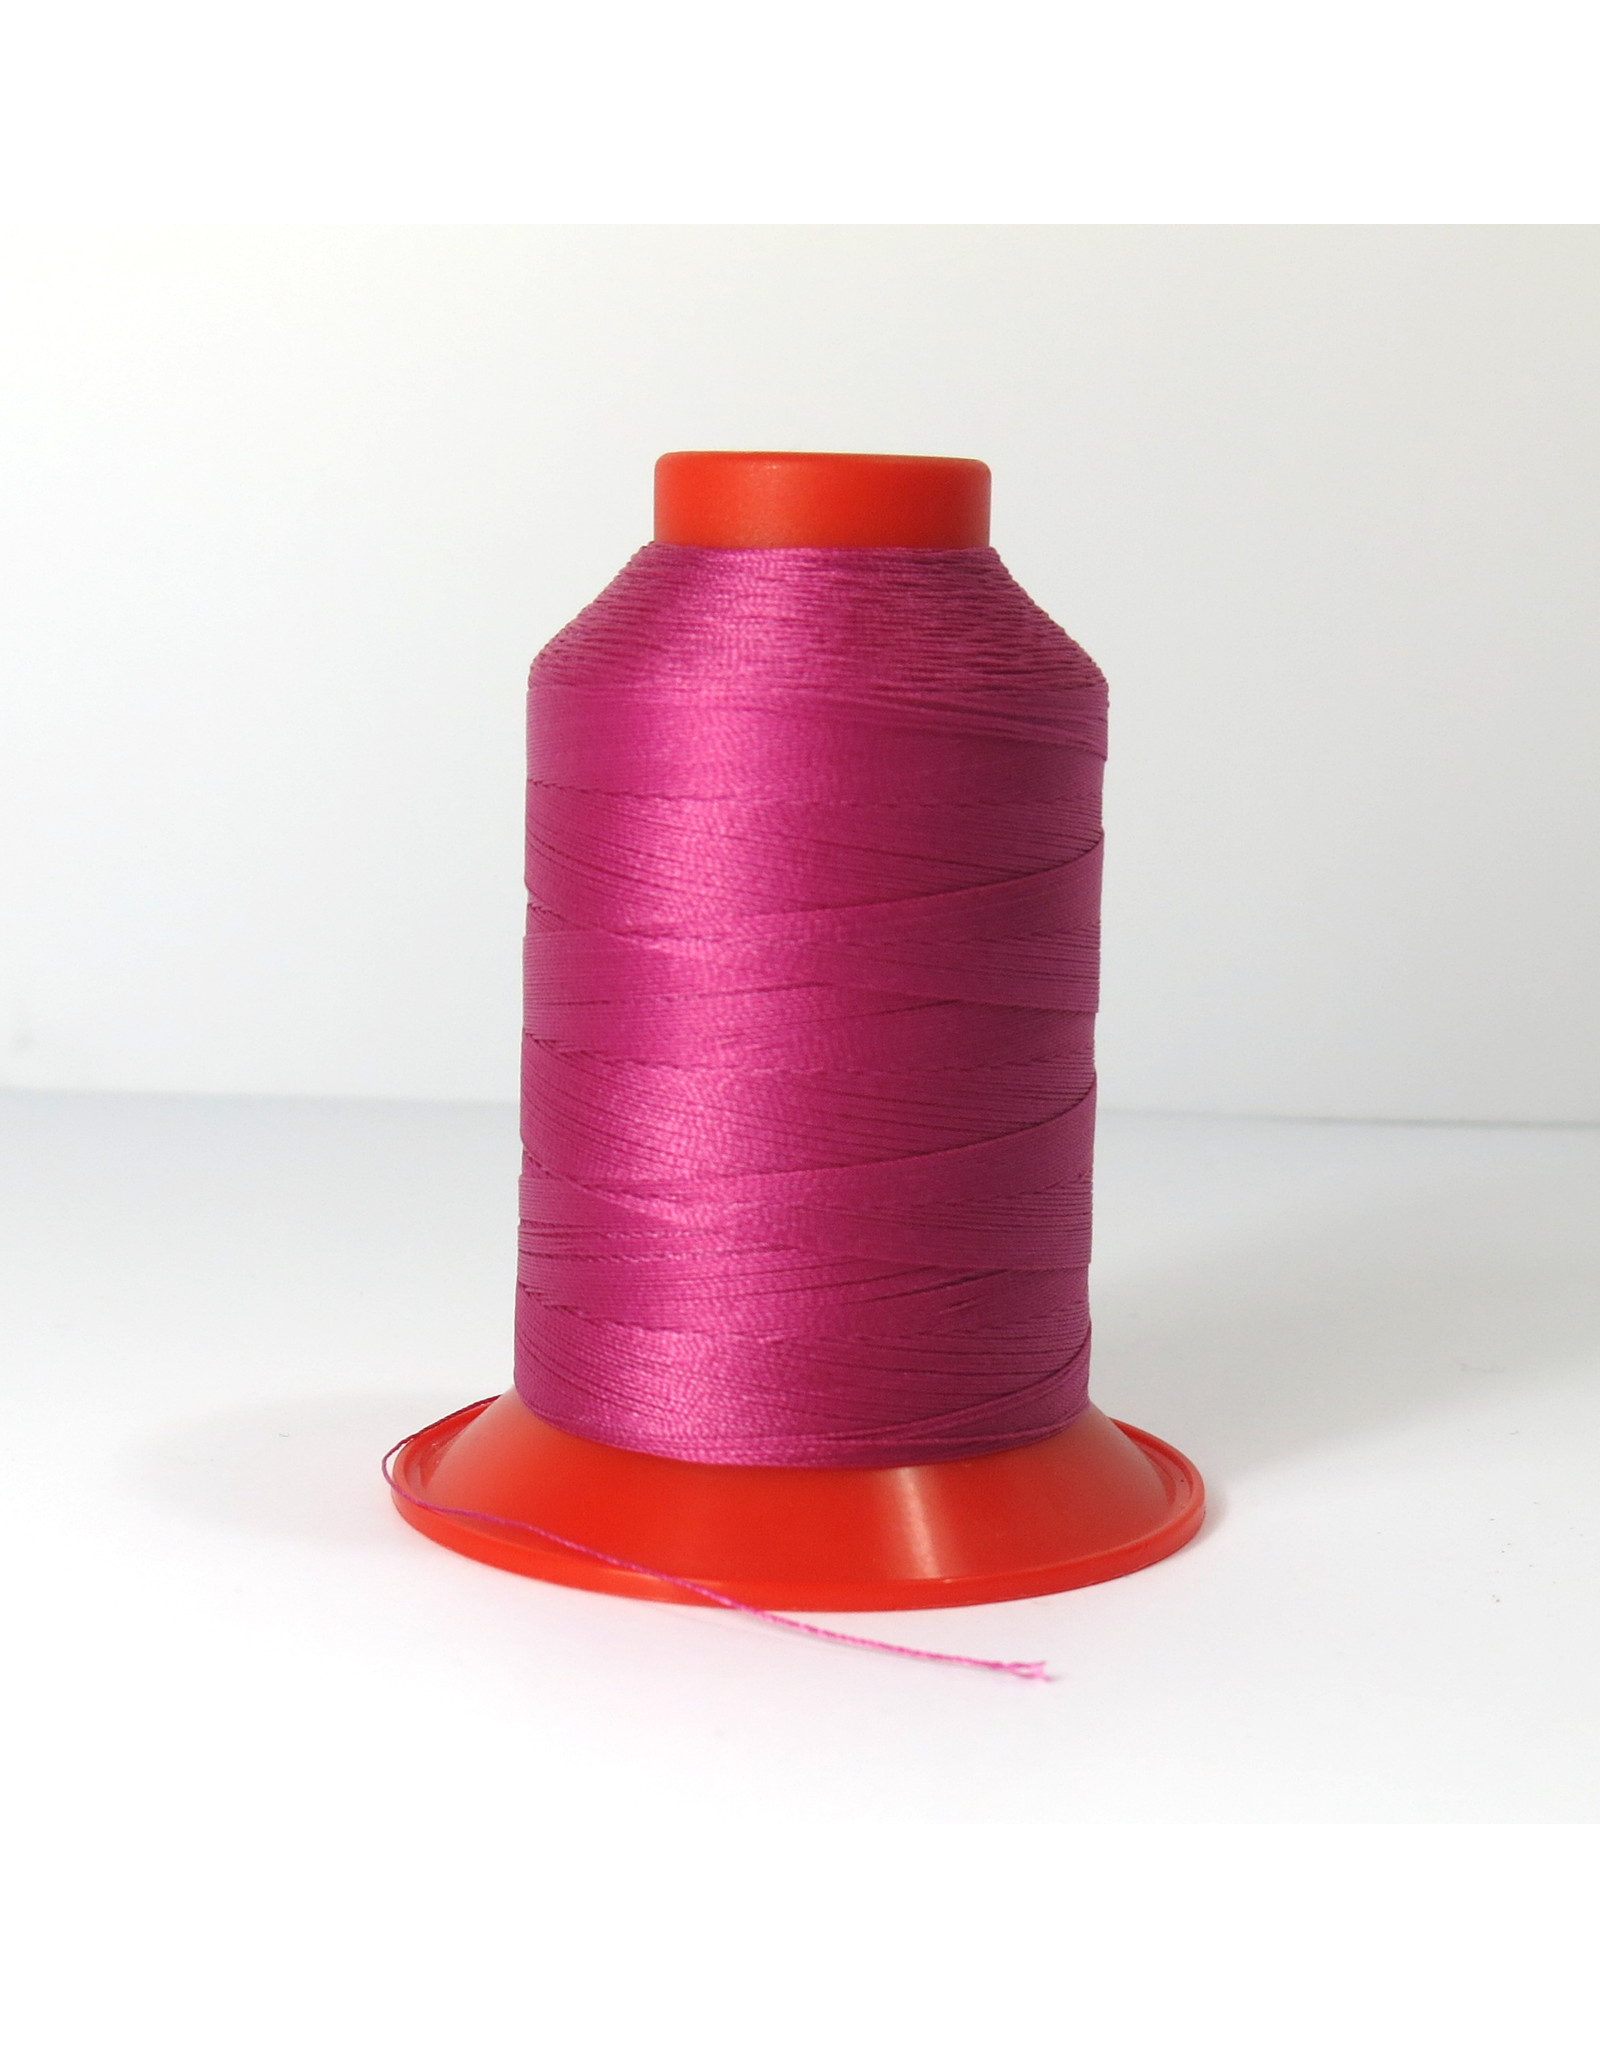 Serafil machine sewing threads 1417